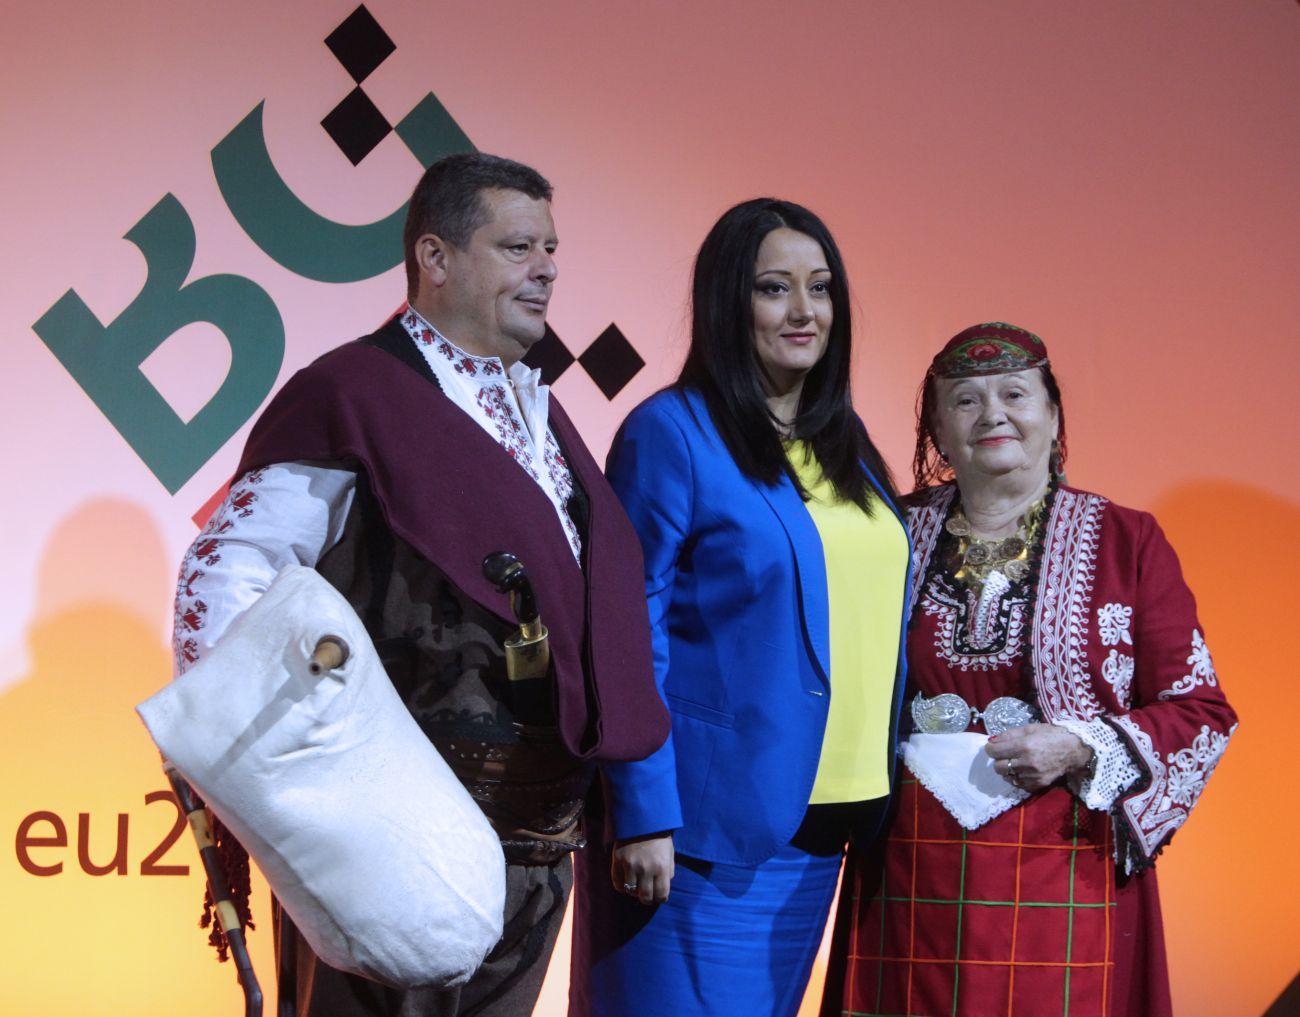 Руски медии коментират българското европредседателство